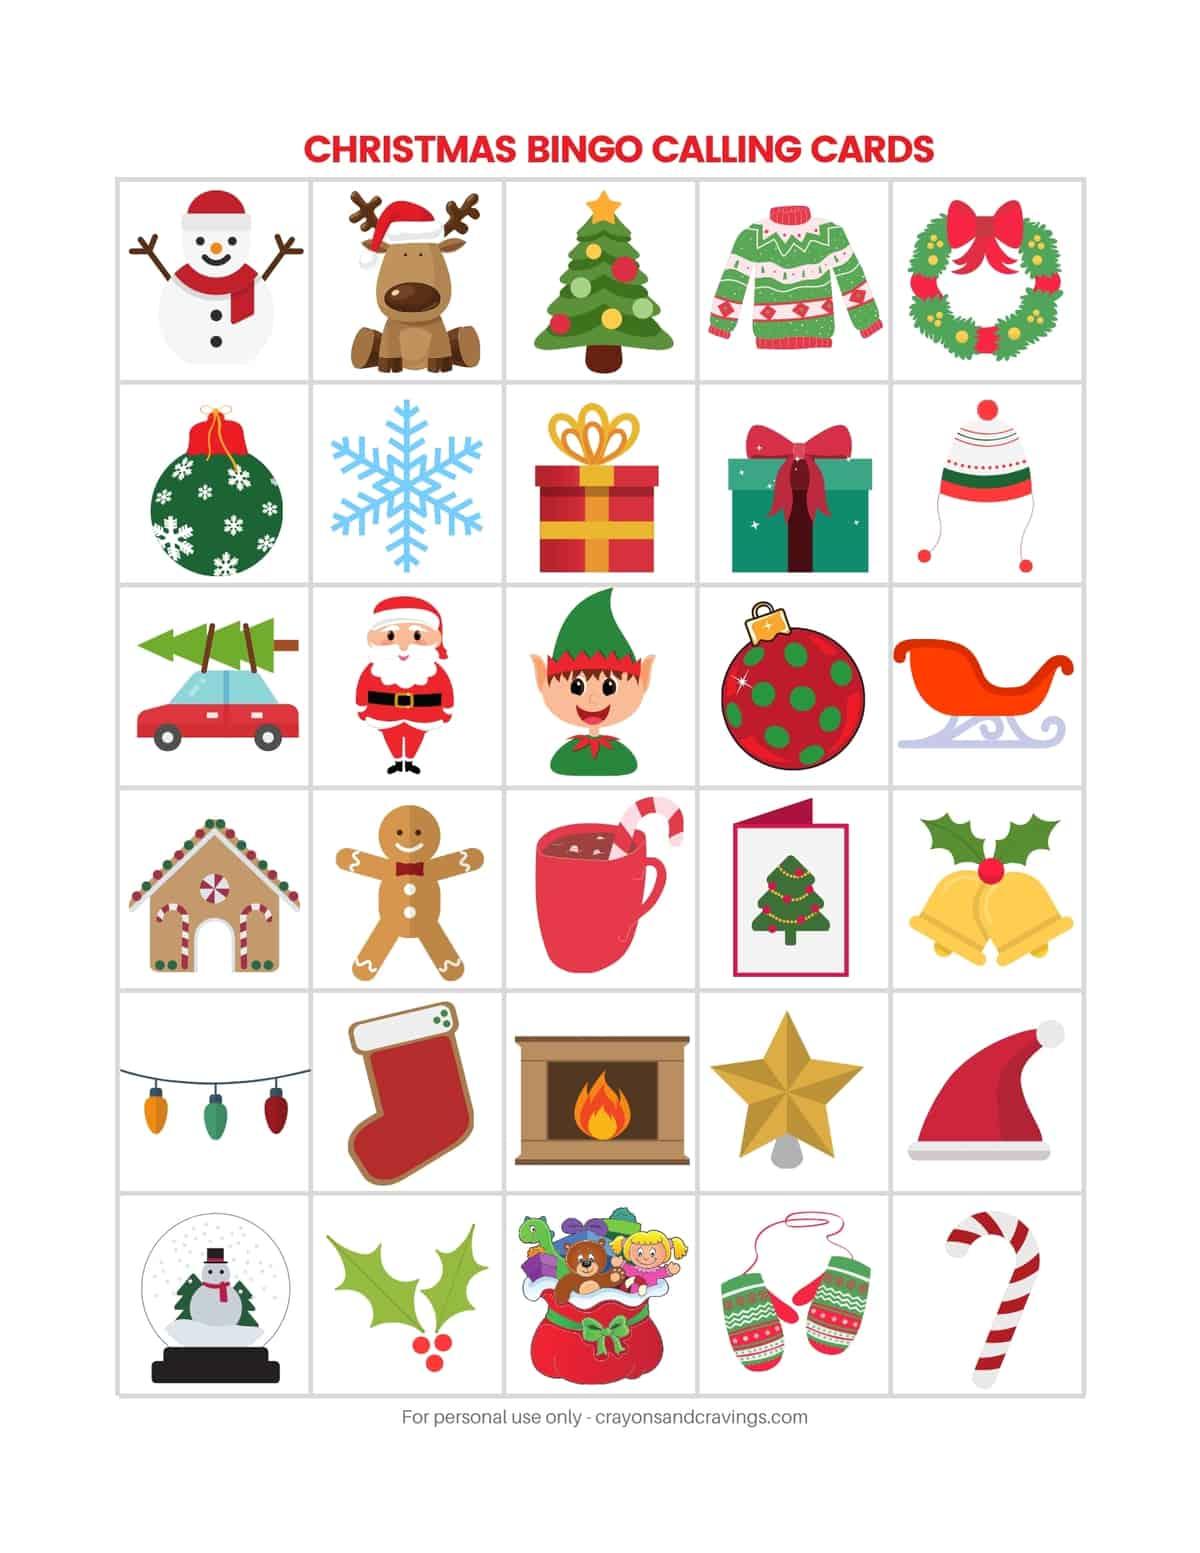 Christmas Bingo Calling Cards